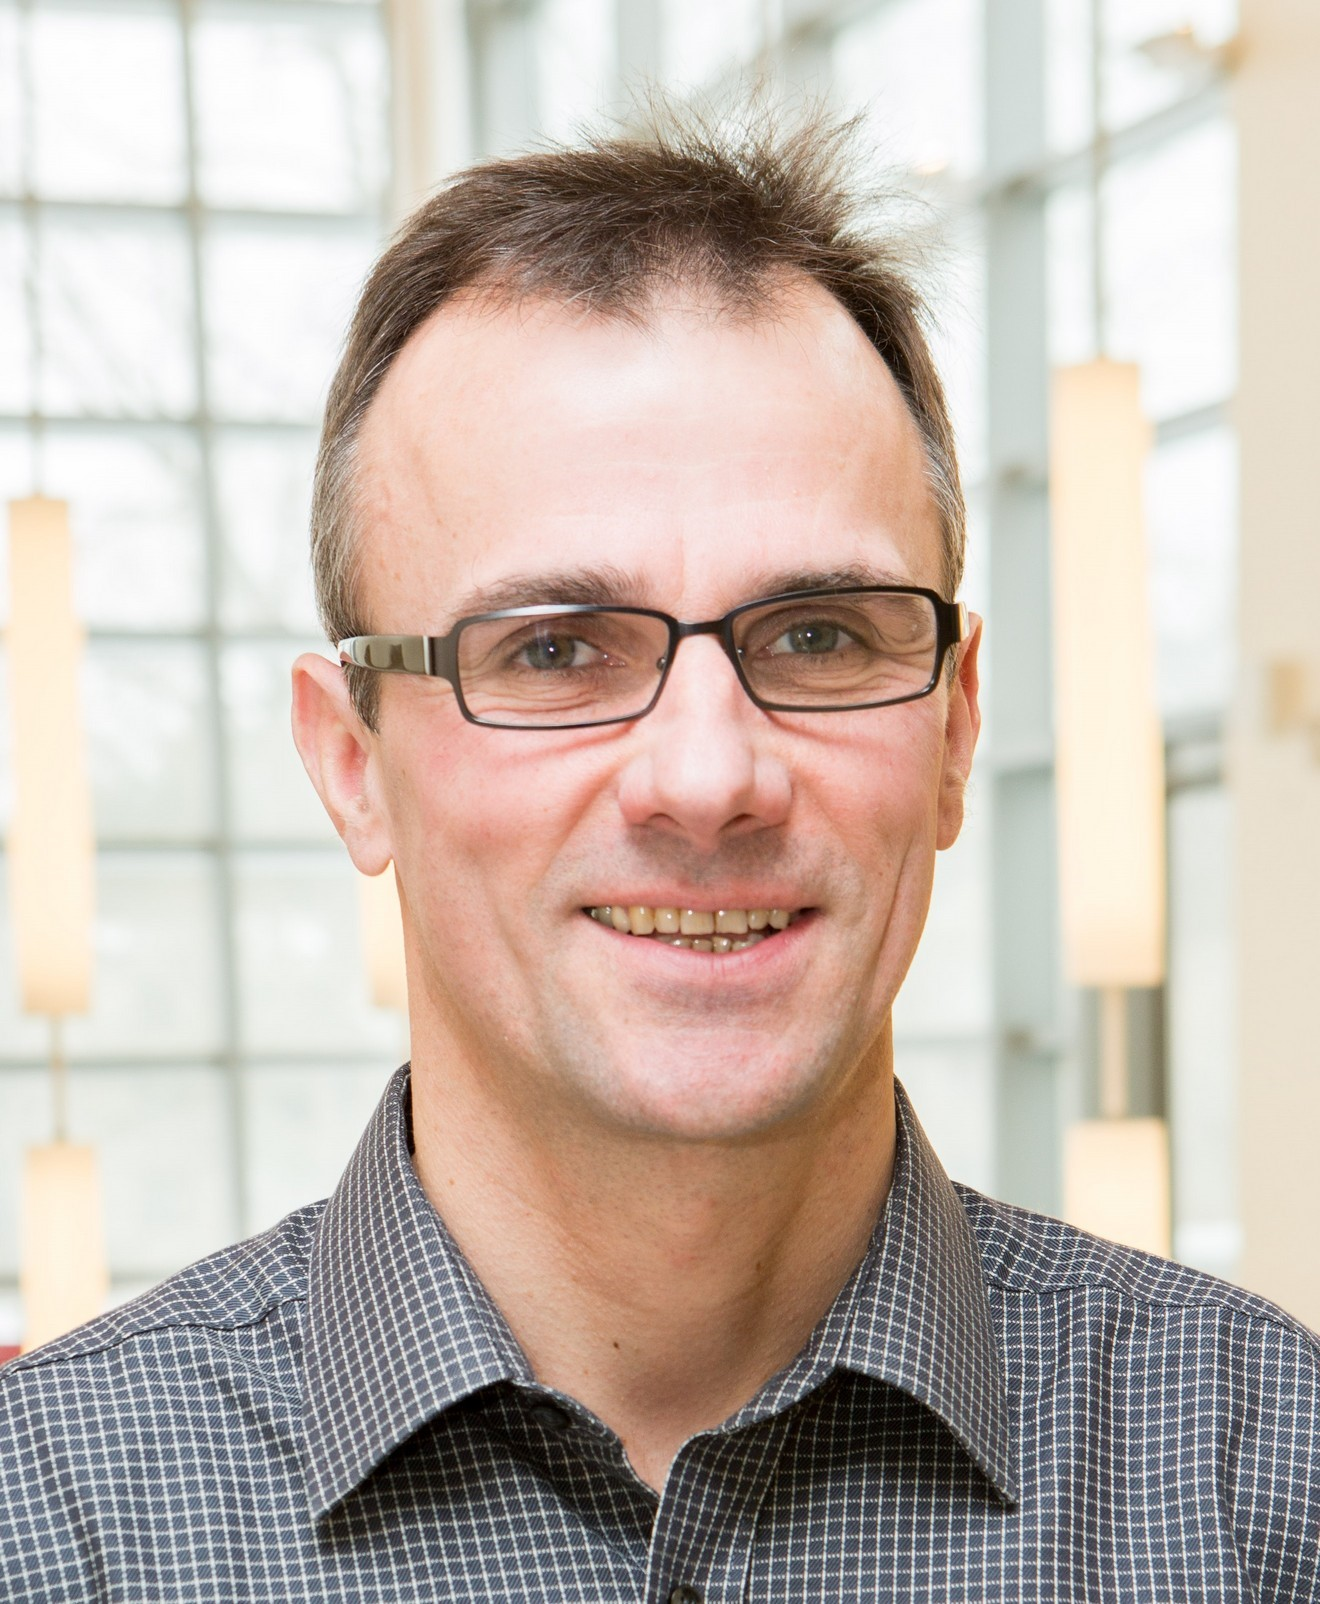 Prof. Stefan Judex